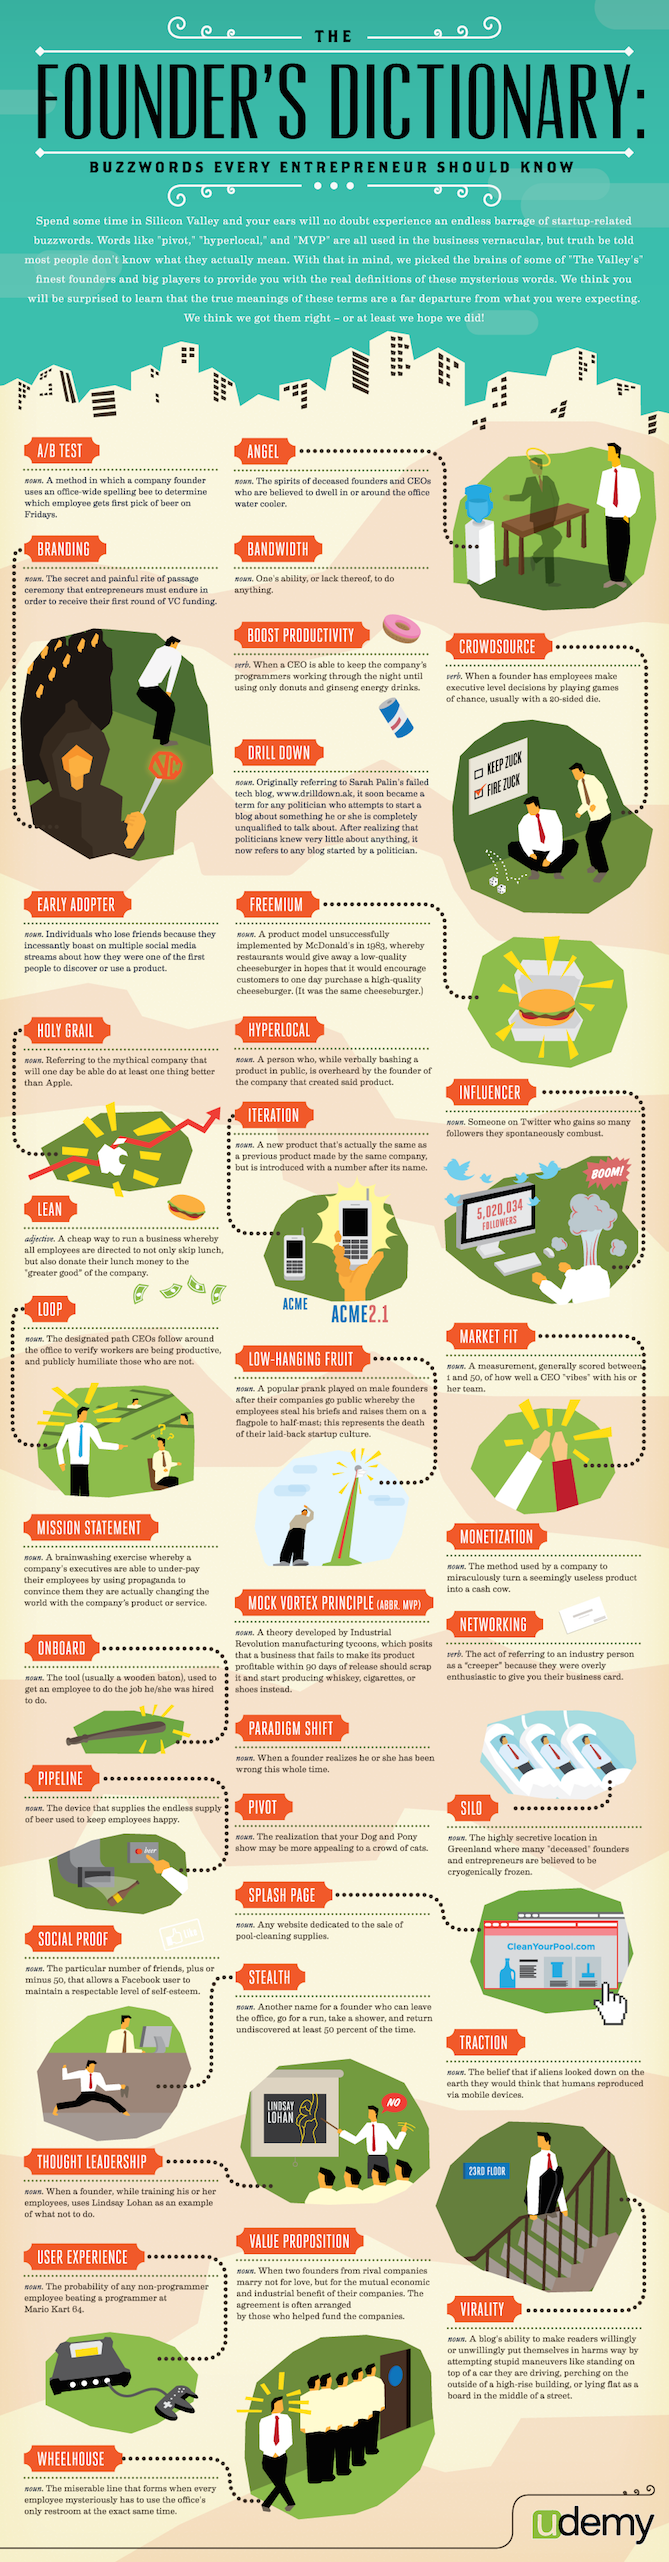 35 Buzzwords Every Entrepreneur Should Know